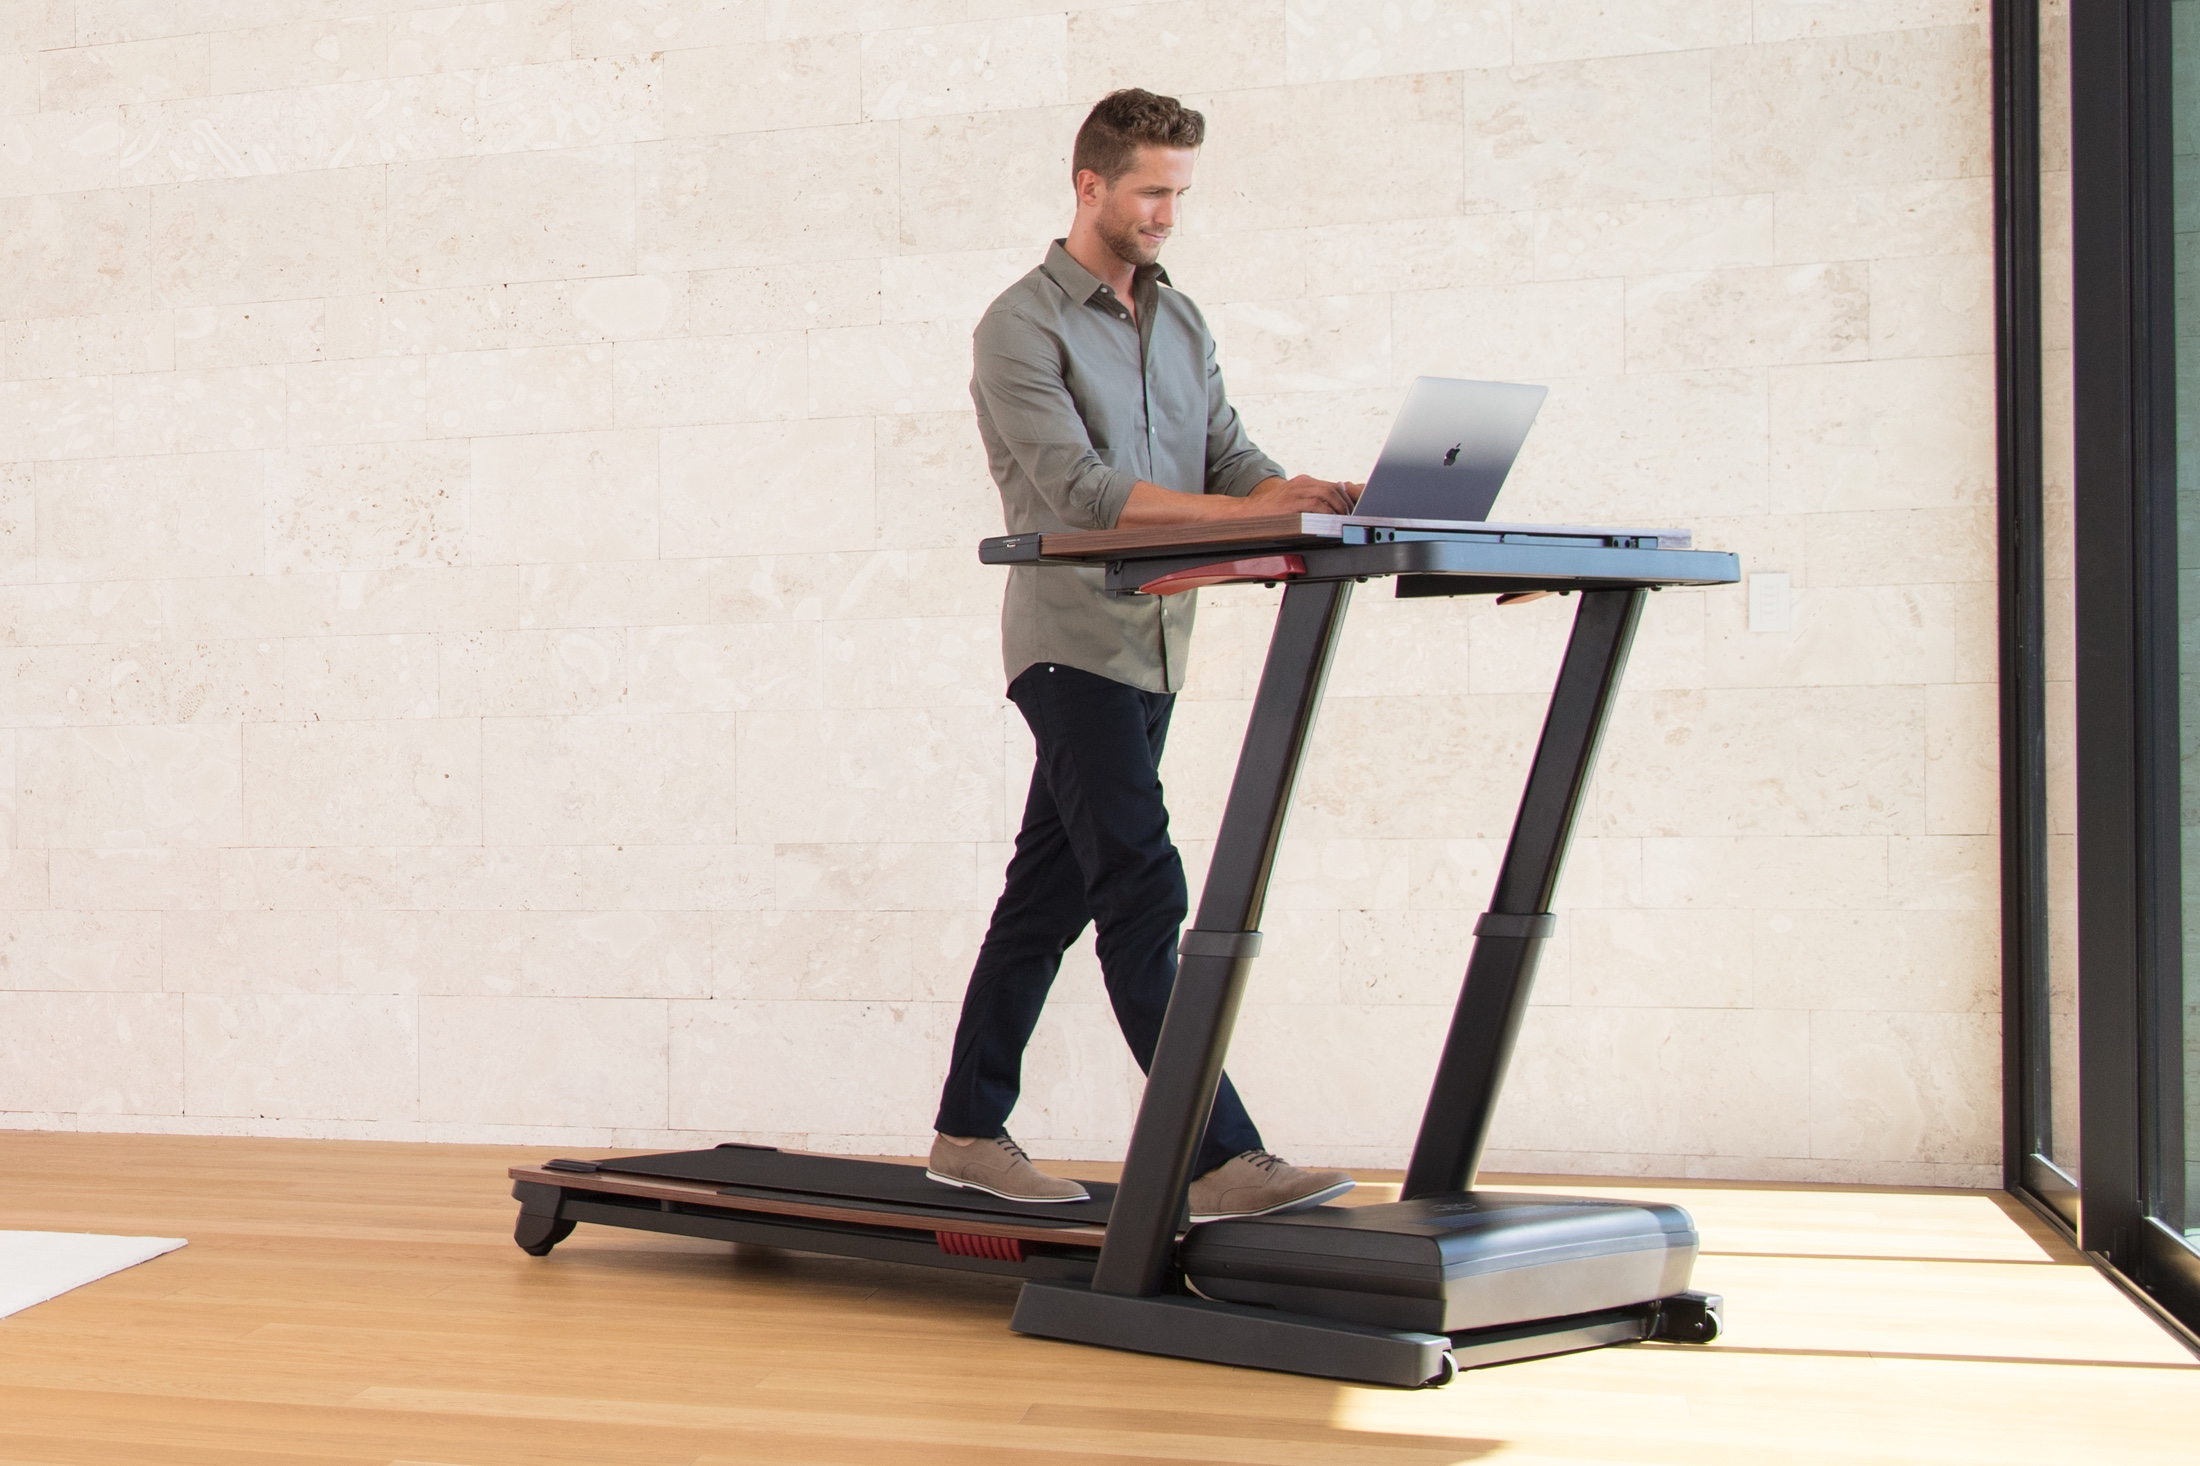 NordicTrack Treadmill Desk Platinum gallery image 3